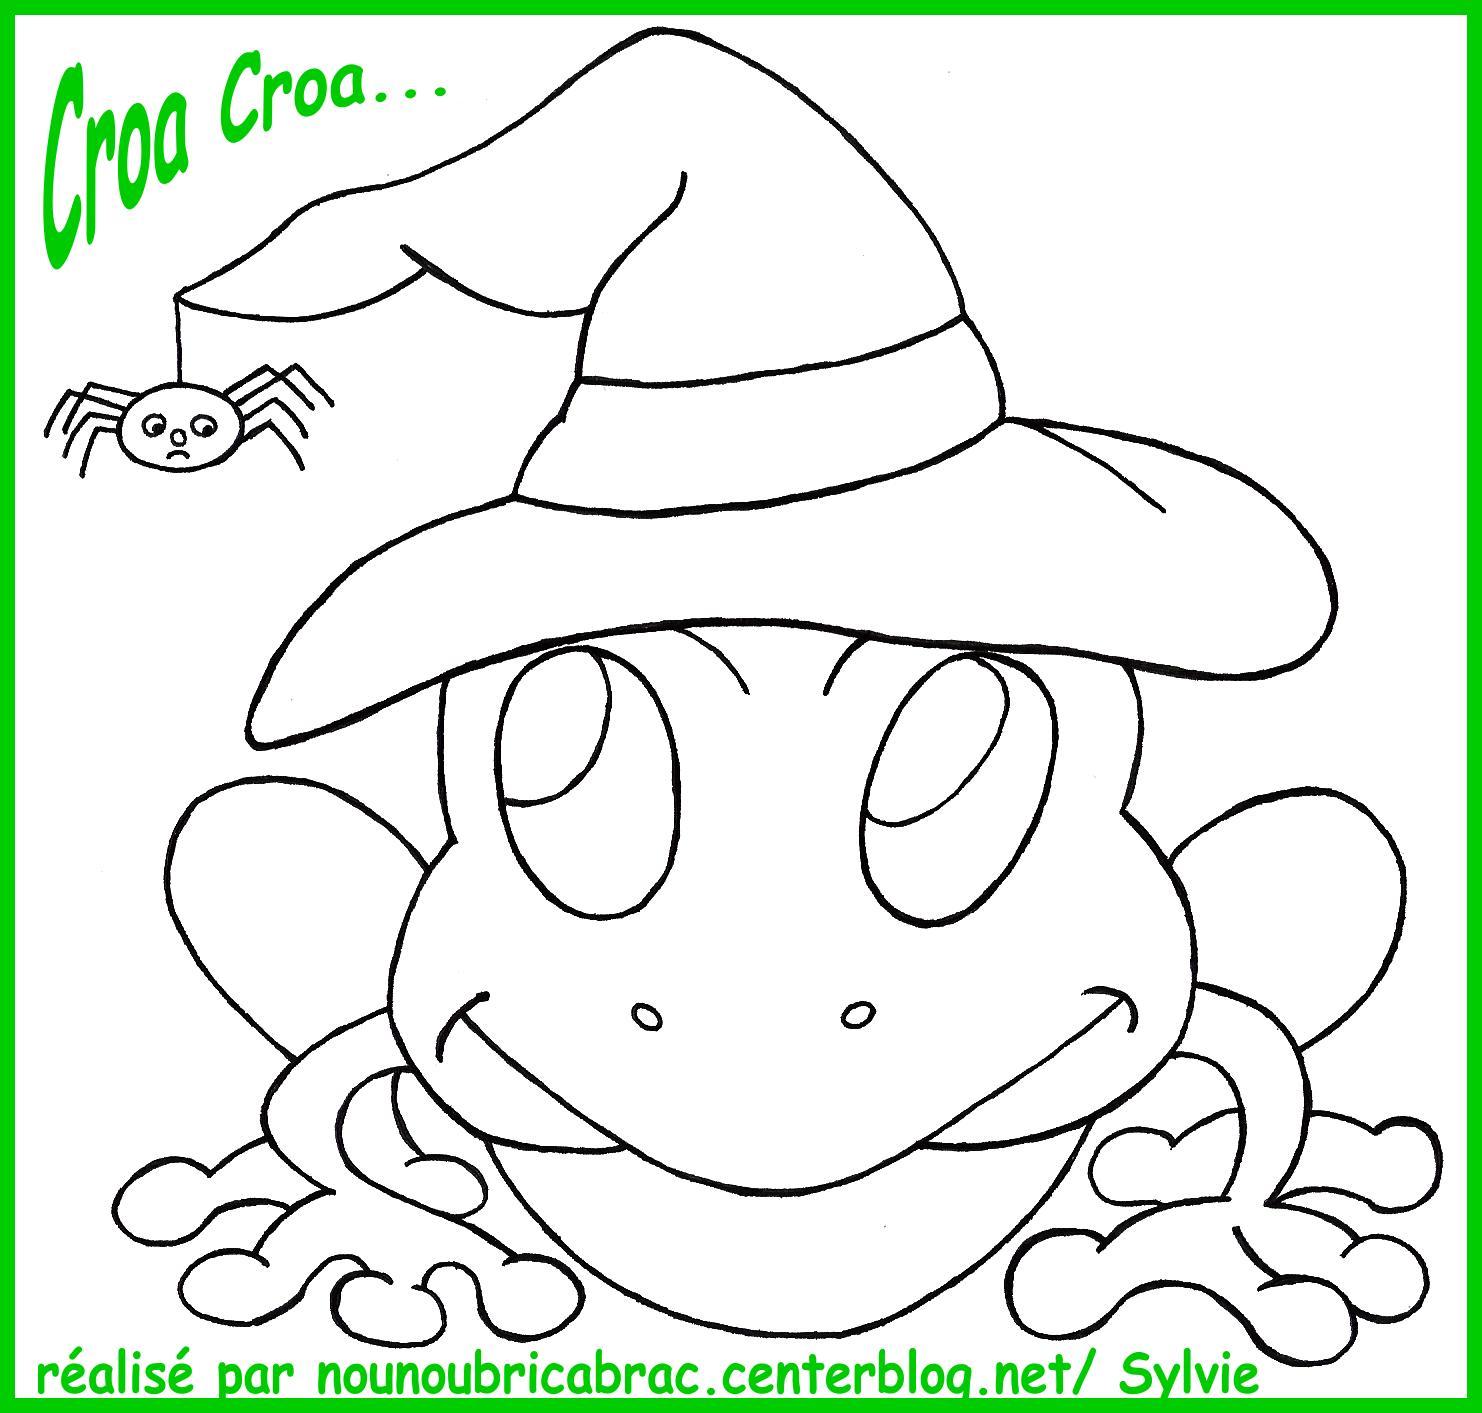 Grenouille centerblog - Coloriage de grenouille ...